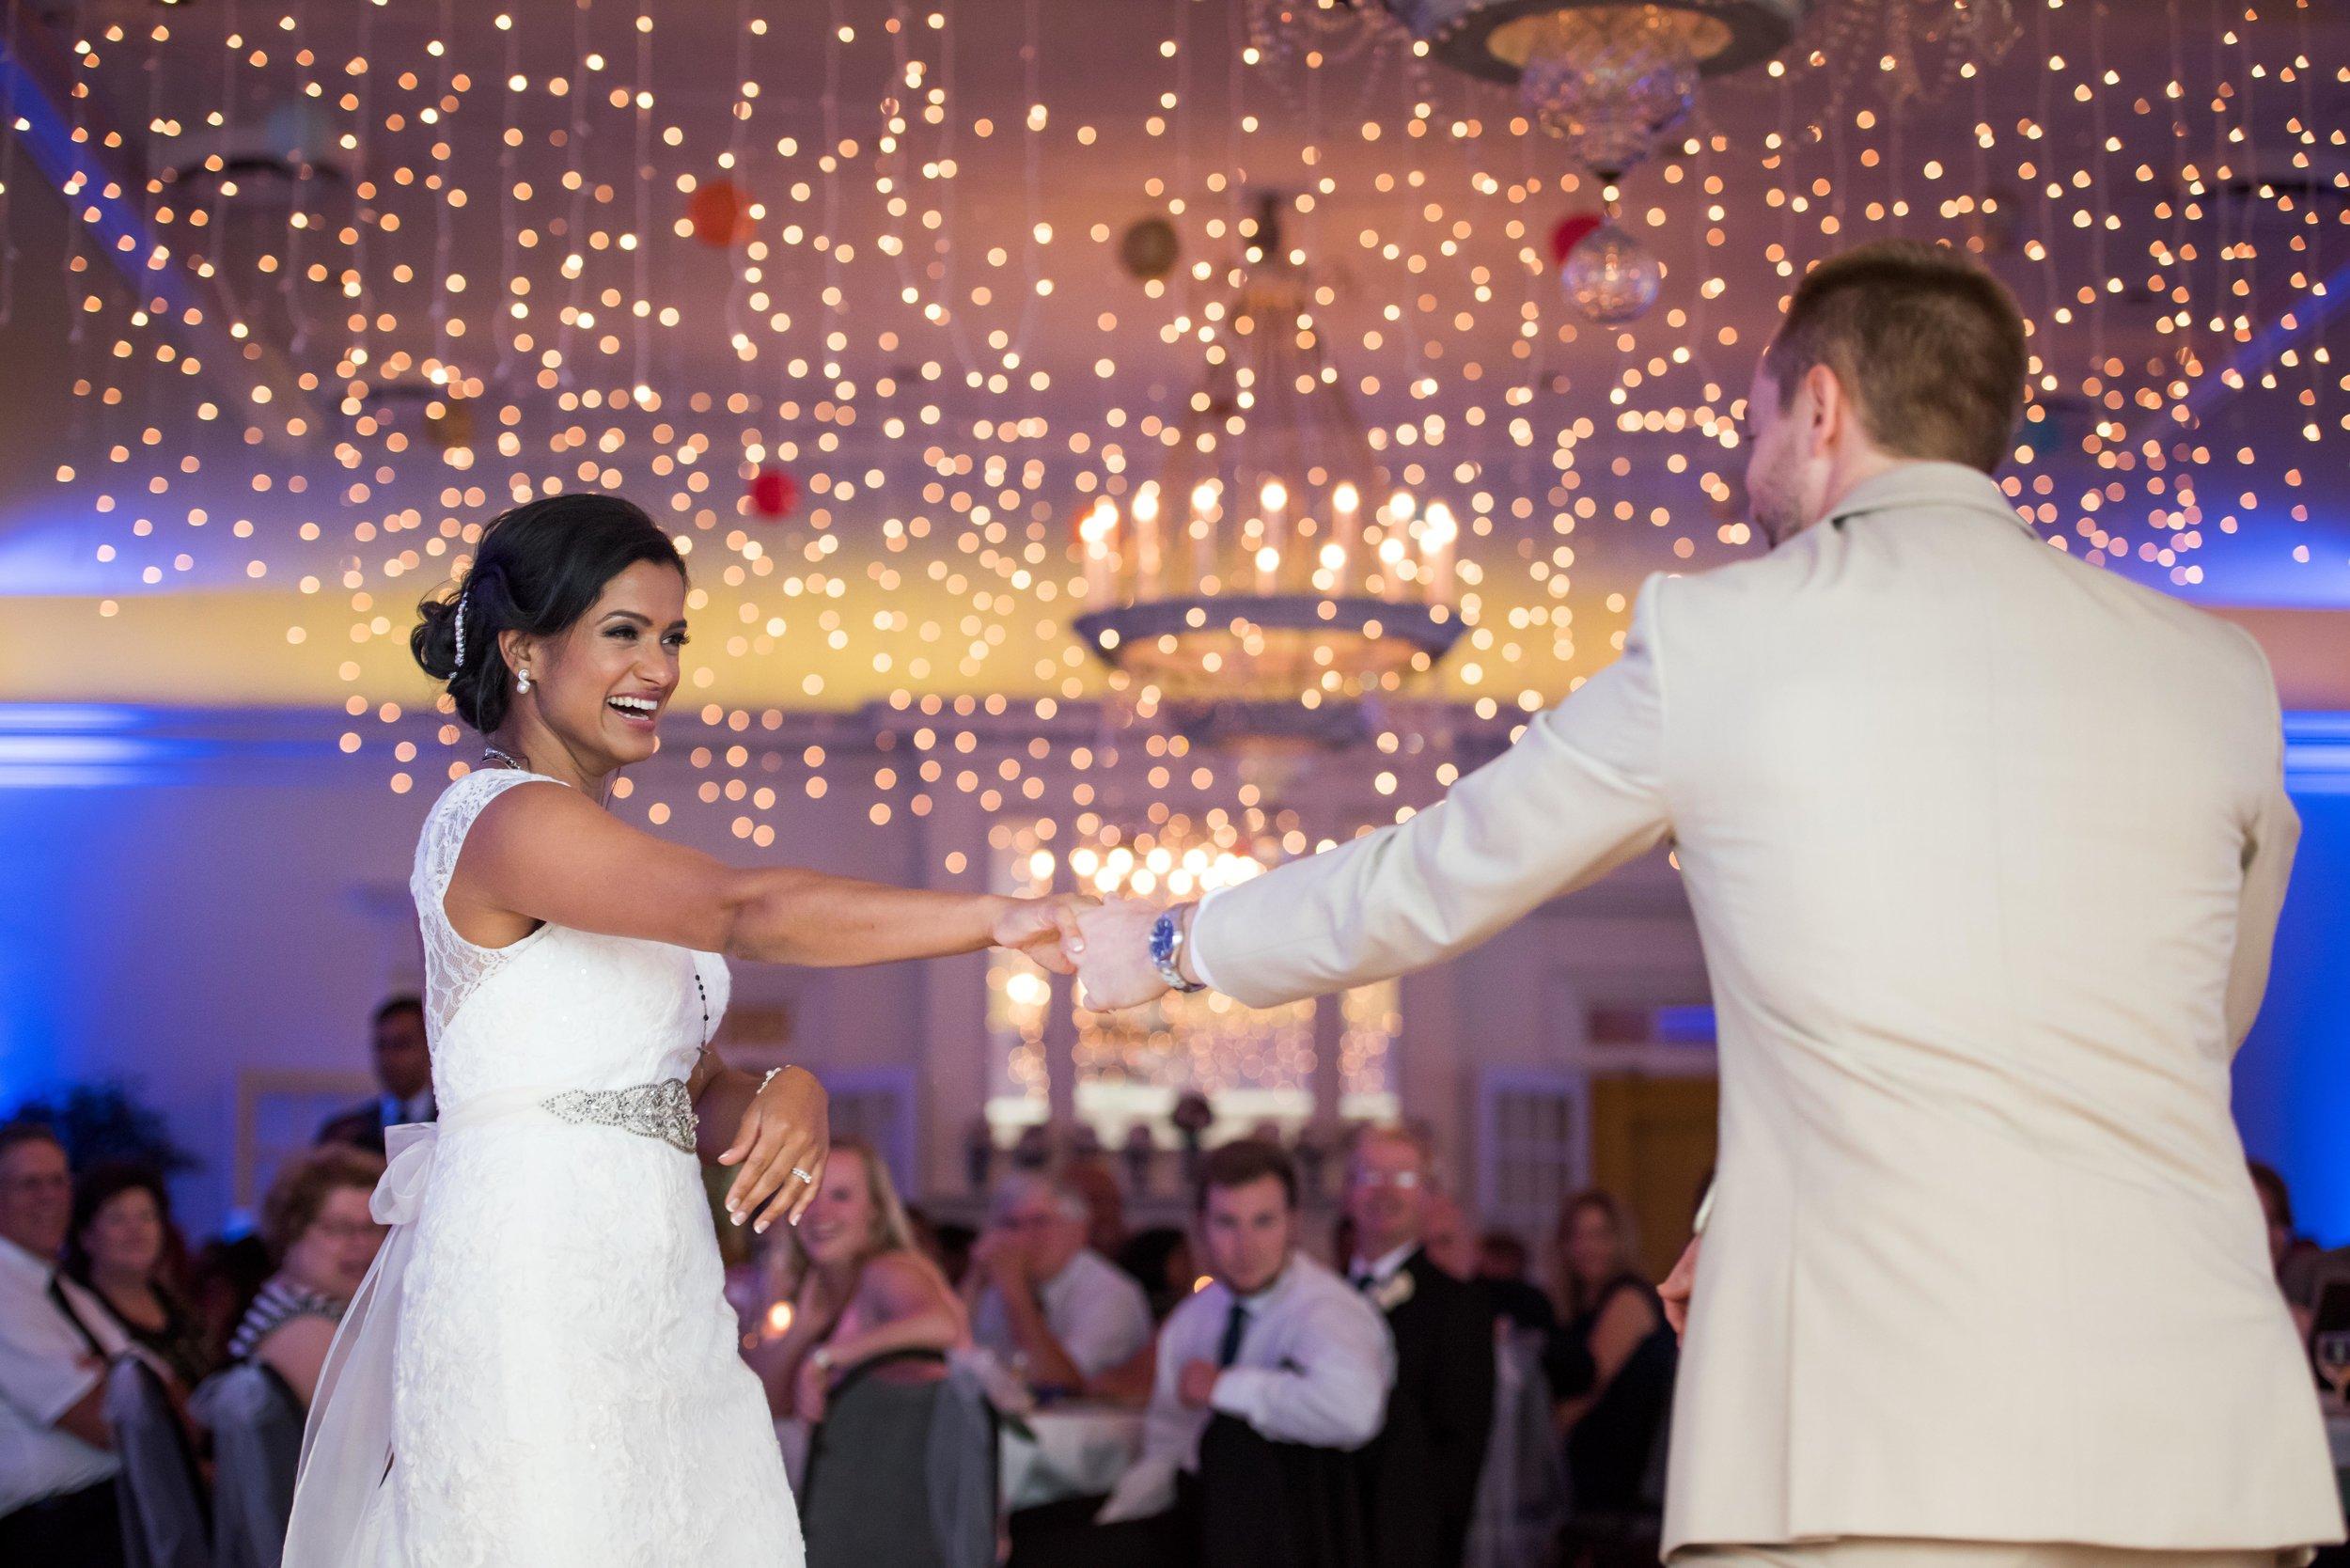 Starmount Country Club - Greensboro NC - Best Wedding Venues in NC 2.jpg